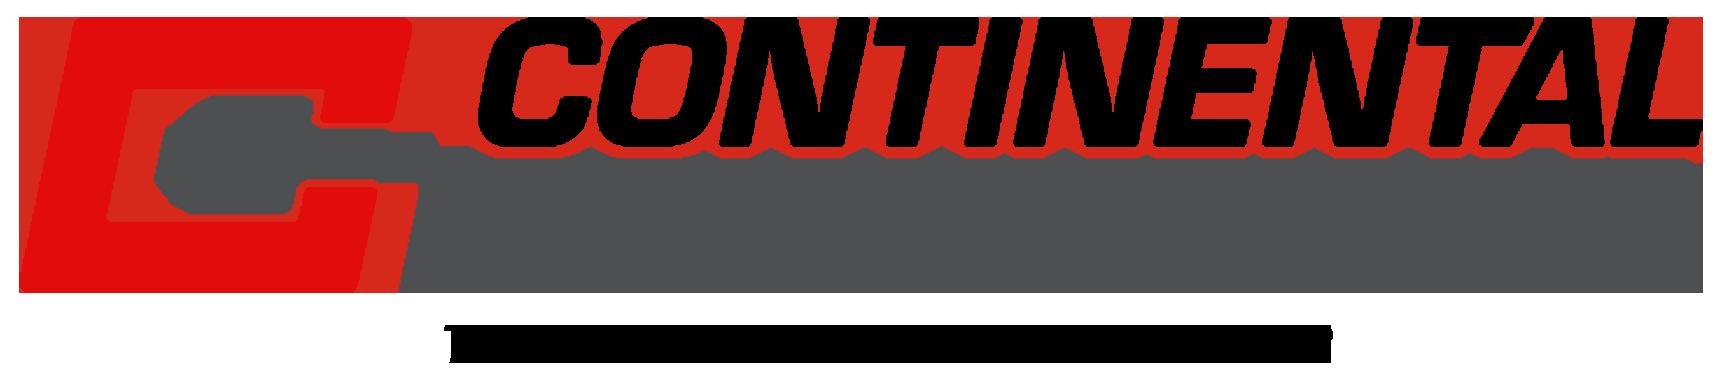 PER198636080